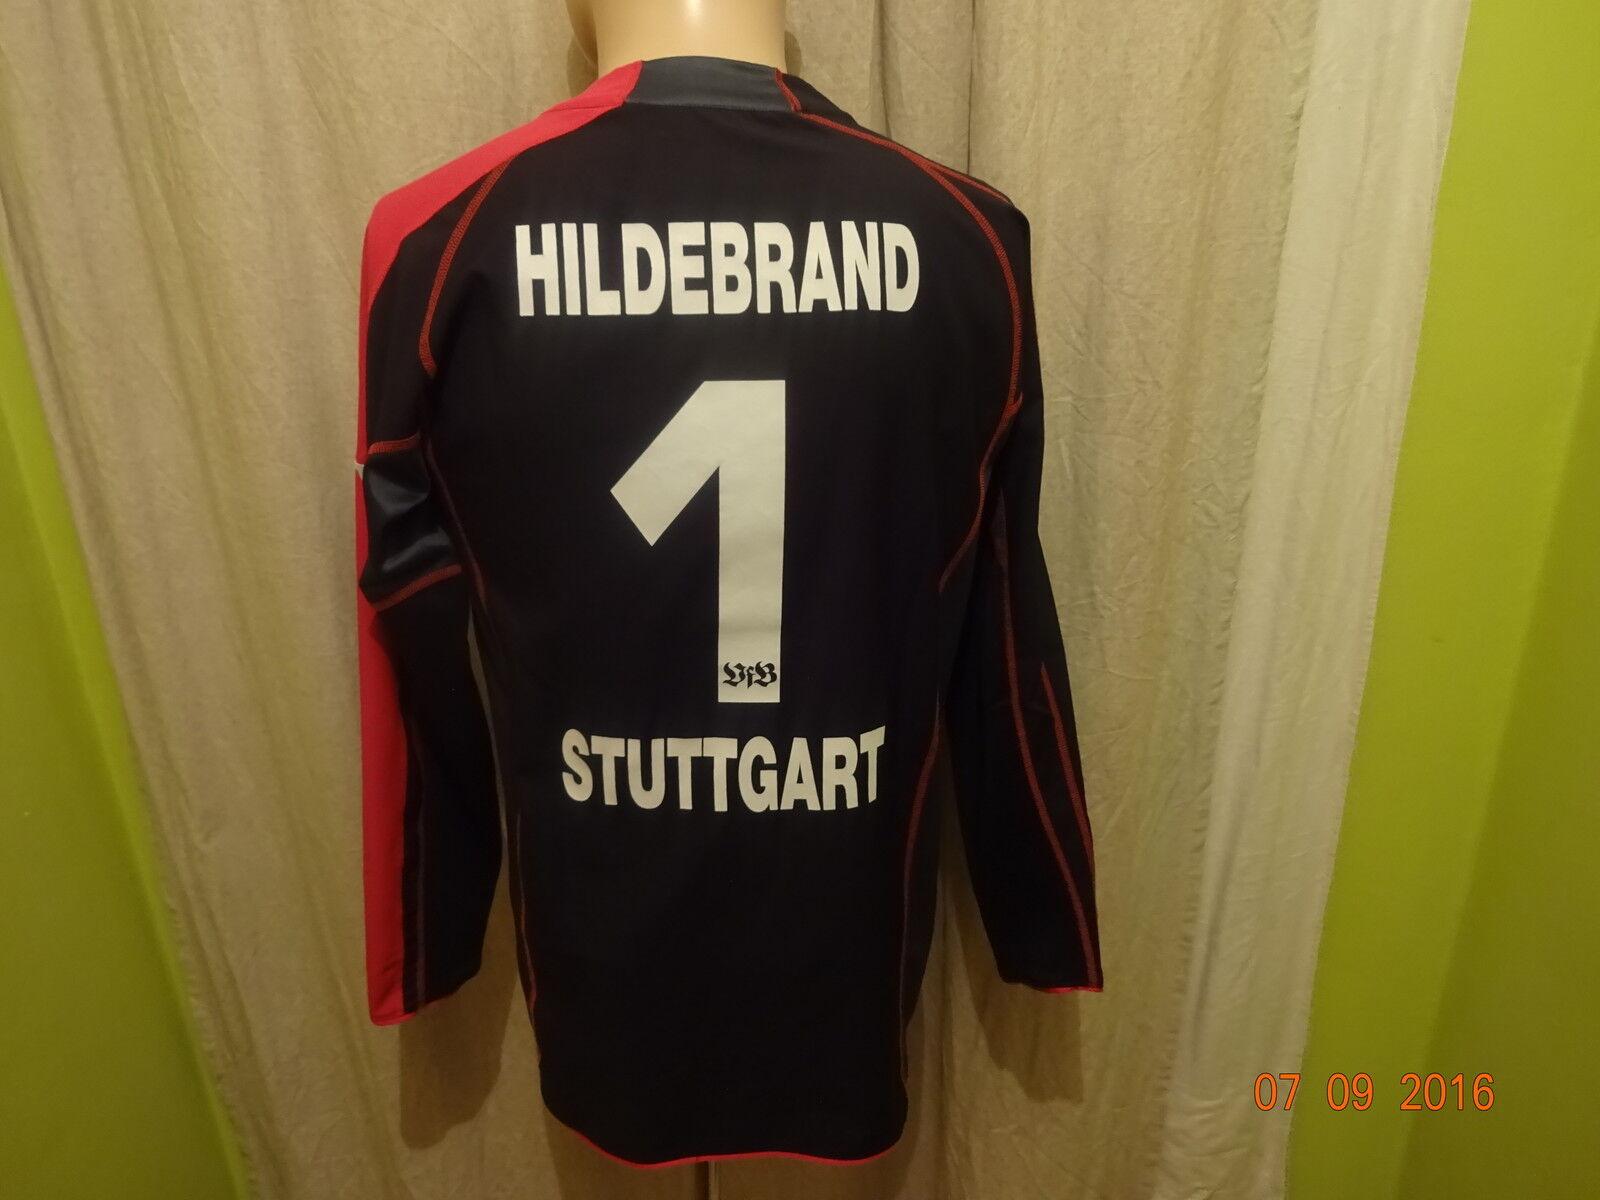 VfB Stuttgart Puma Torwart Trikot 2005 06  EnBW  + Nr.1 Hildebrand Gr.S TOP